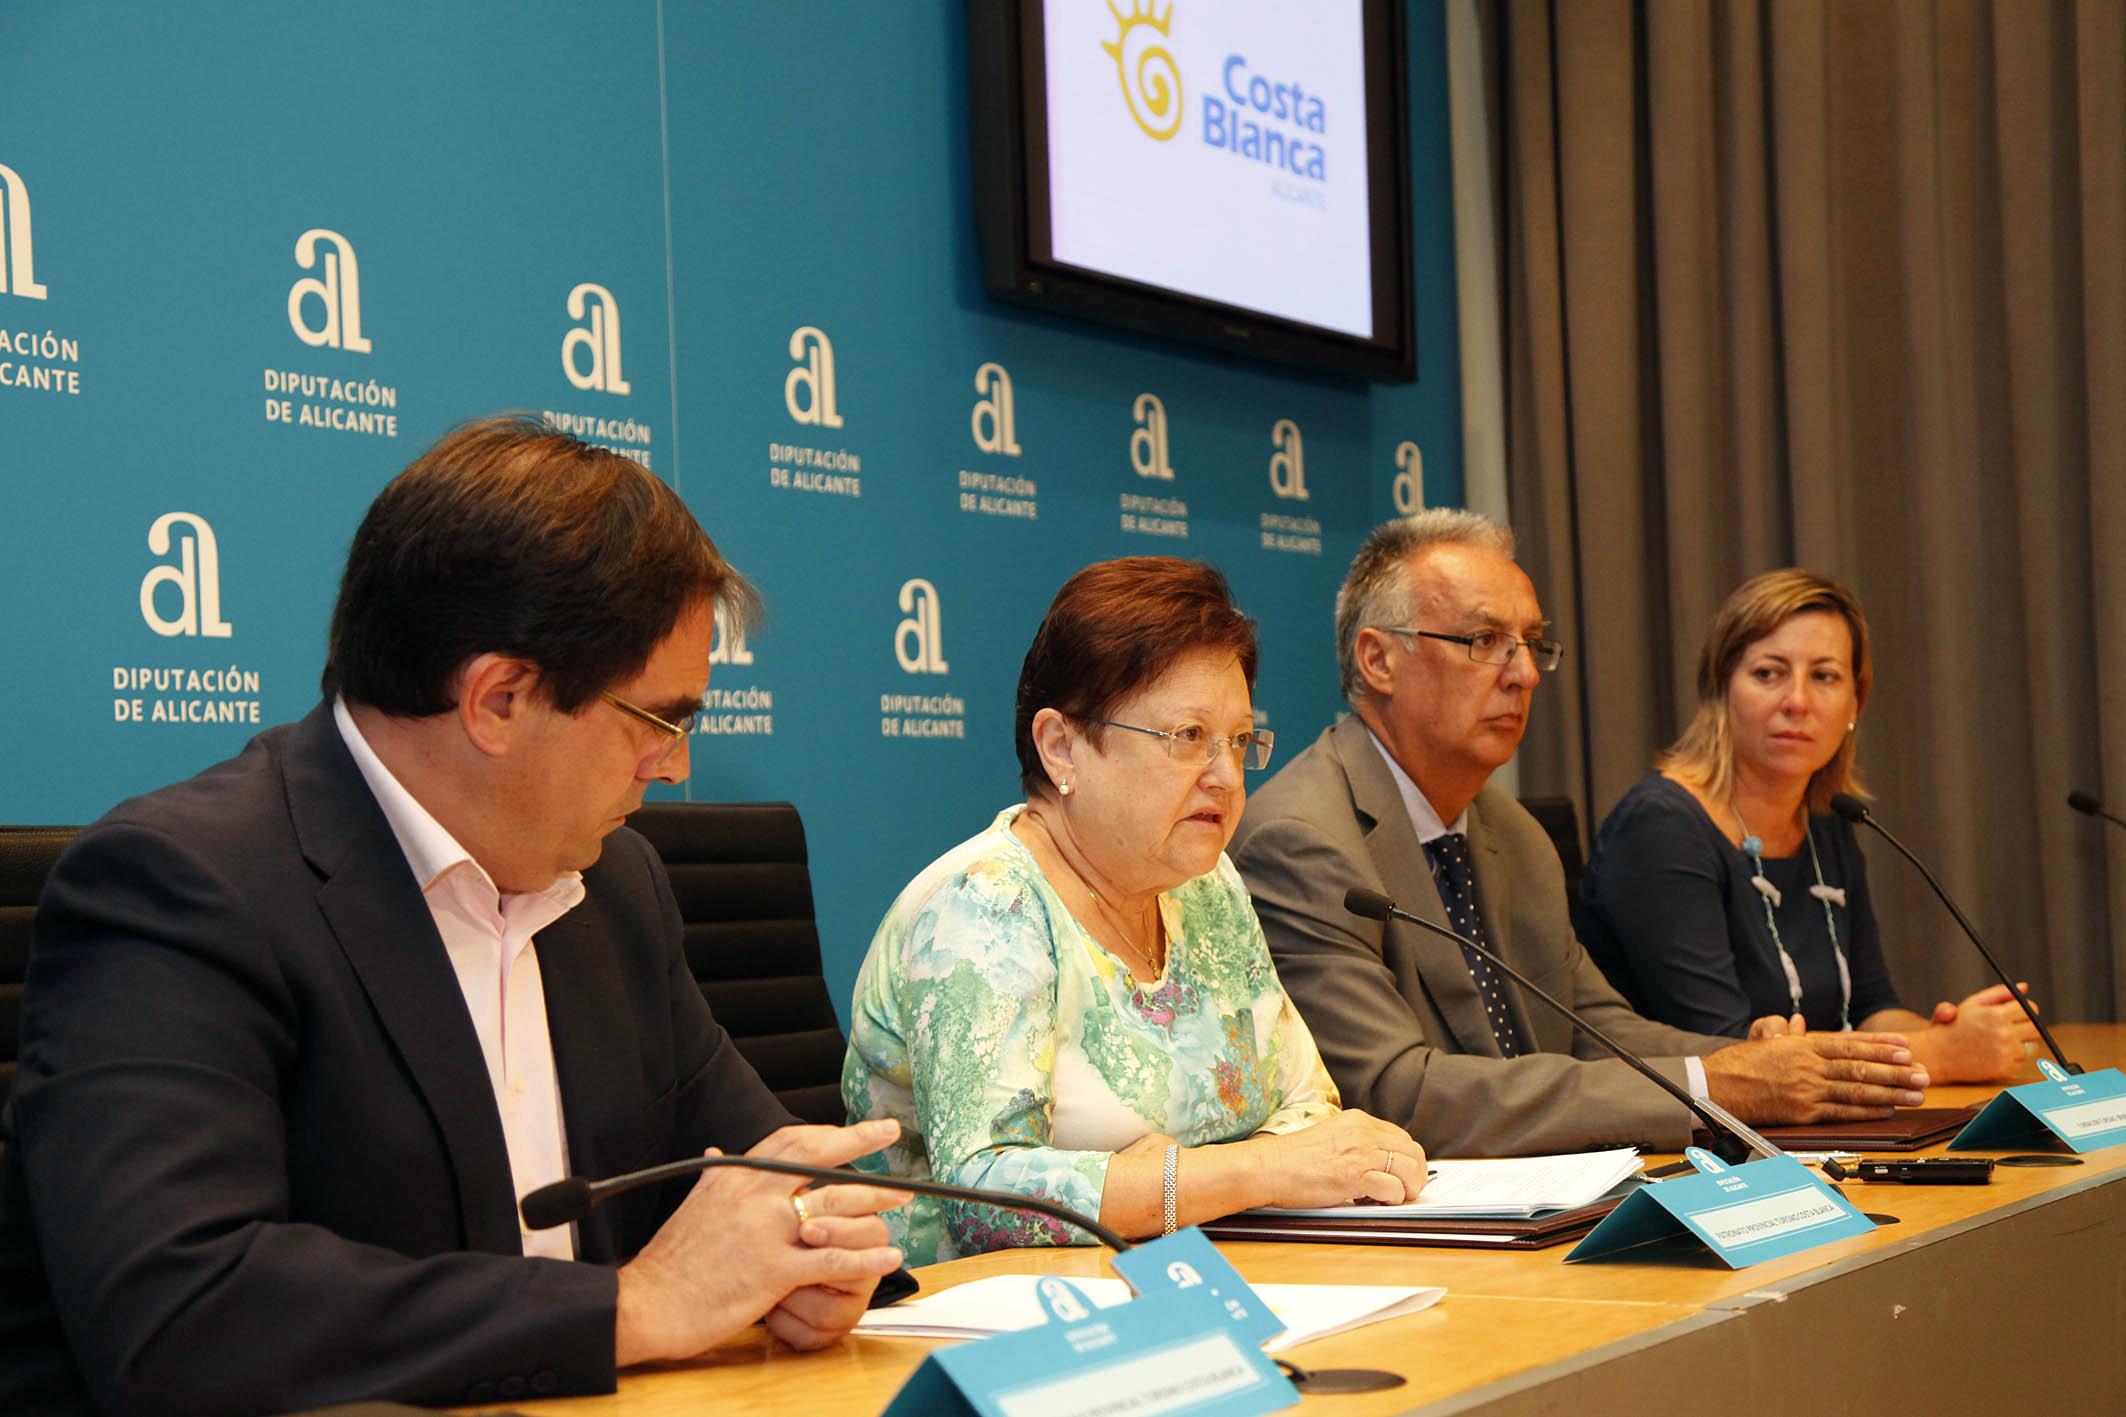 Benidorm logra 'rascar' de Diputación una ayuda de 40.000 euros para promoción